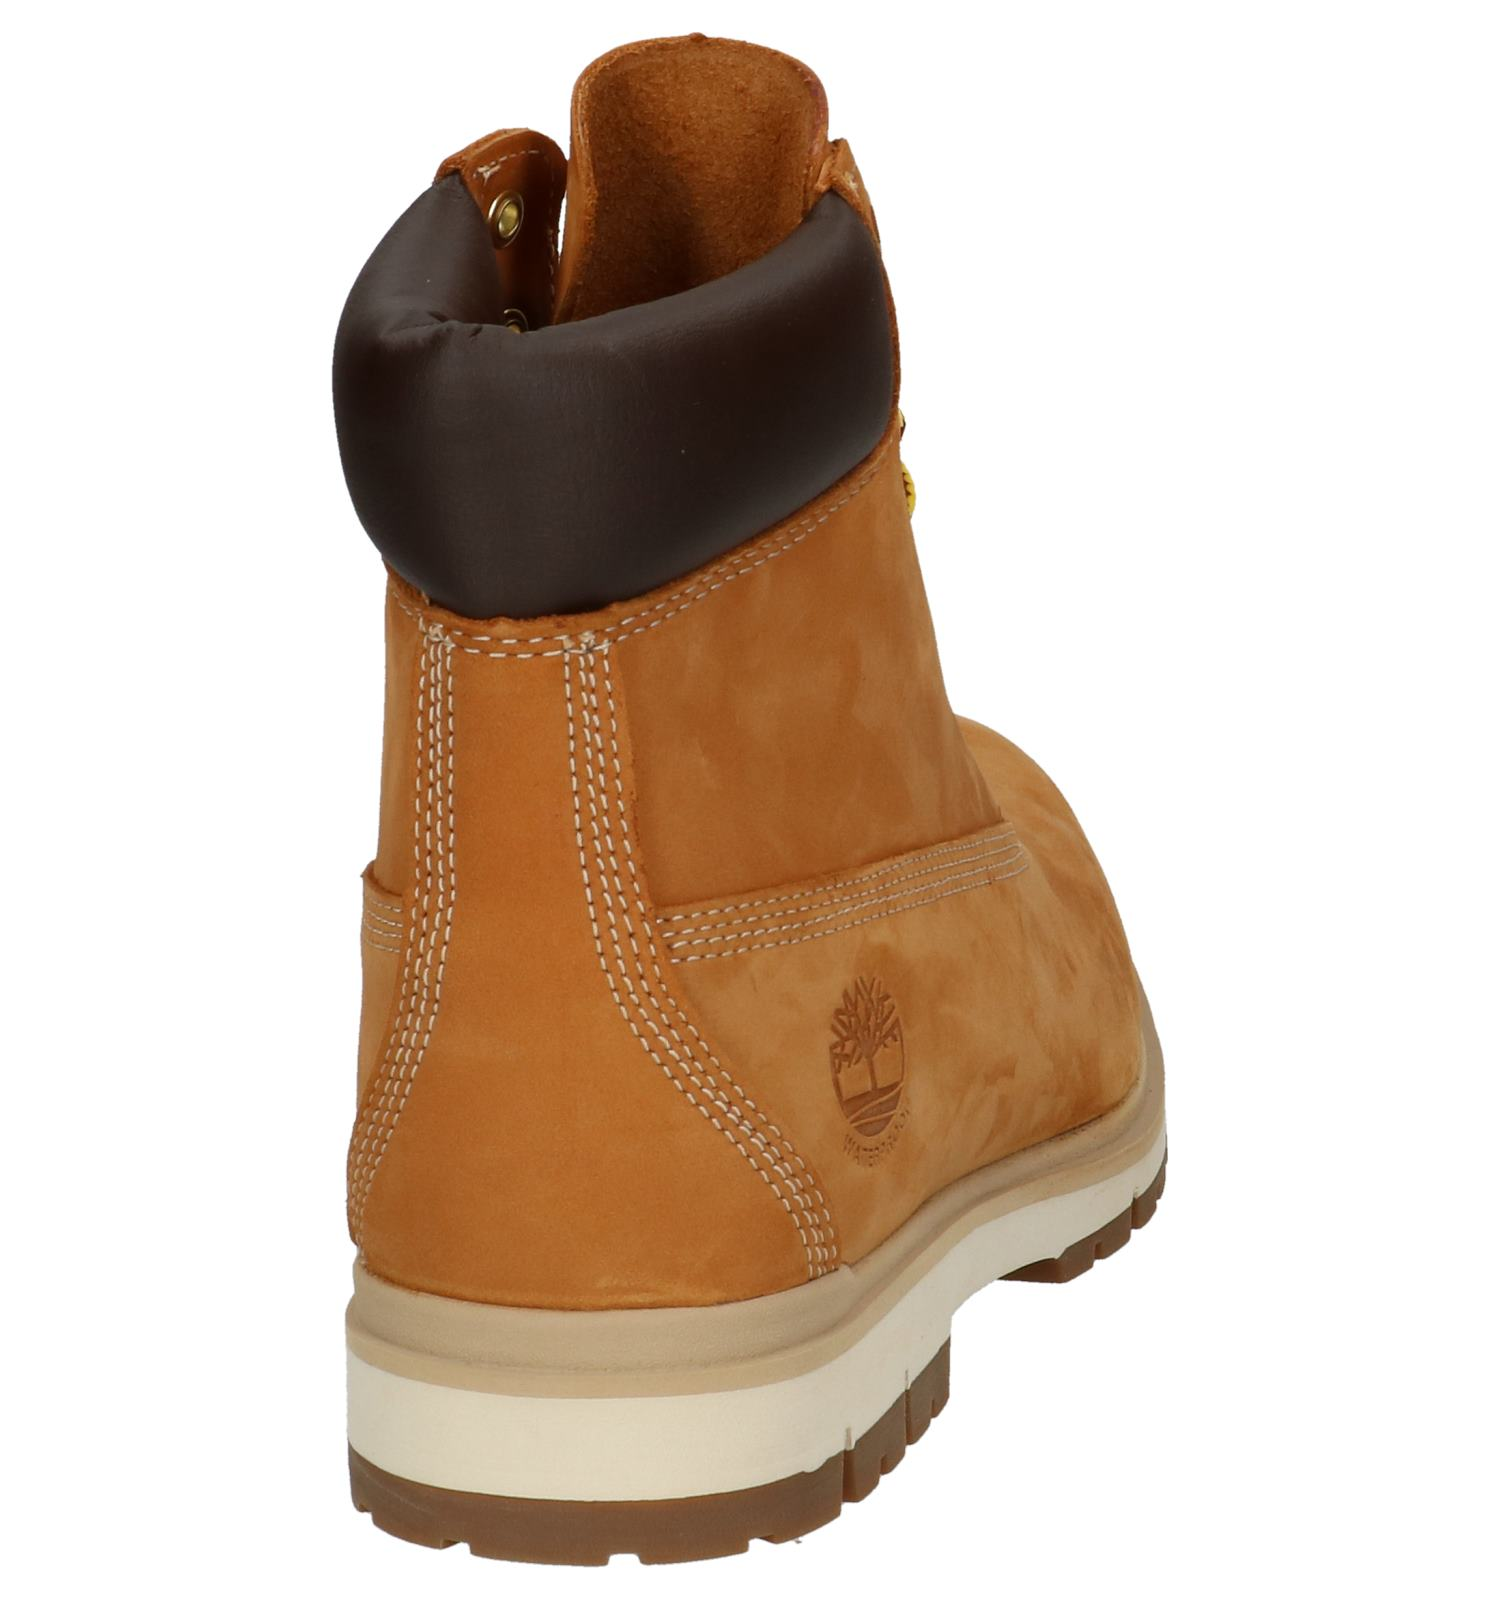 Gratis Veter Met Boots be Timberland Radford NaturelTorfs K31lJcTFu